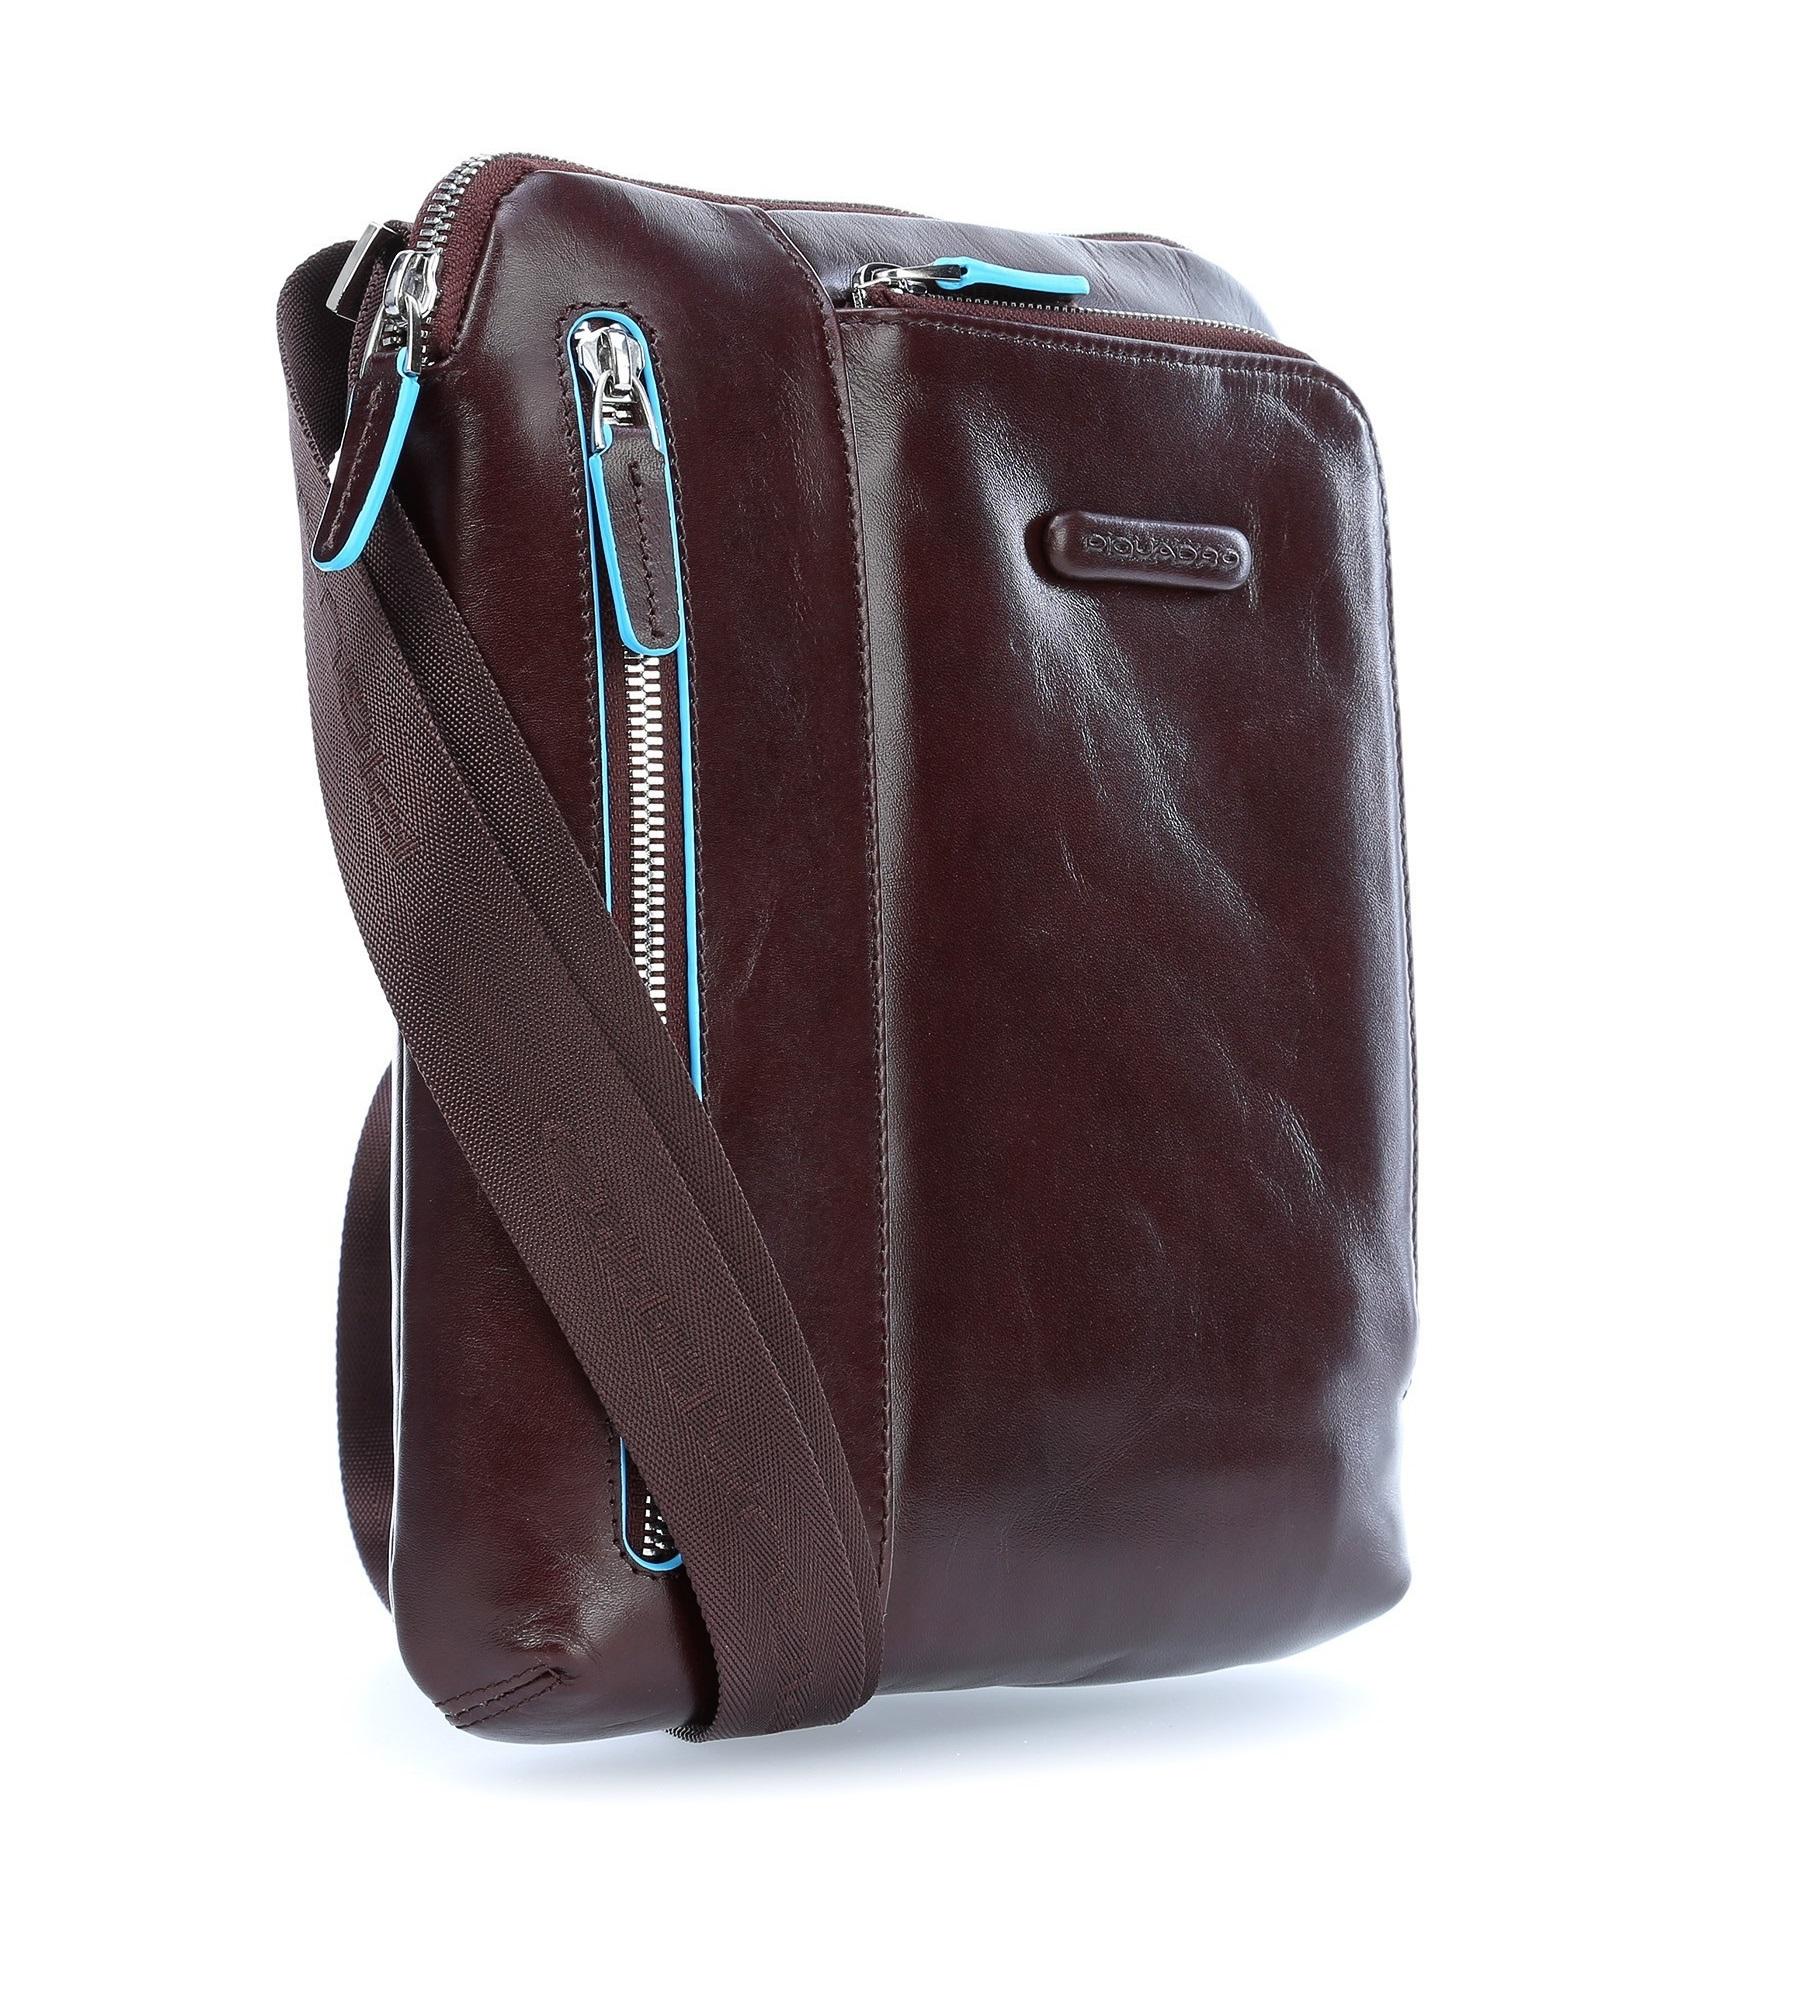 86650aade78d Сумка Piquadro CA1816B2/MO Коричневая - Купить сумку Пиквадро | Time Bags